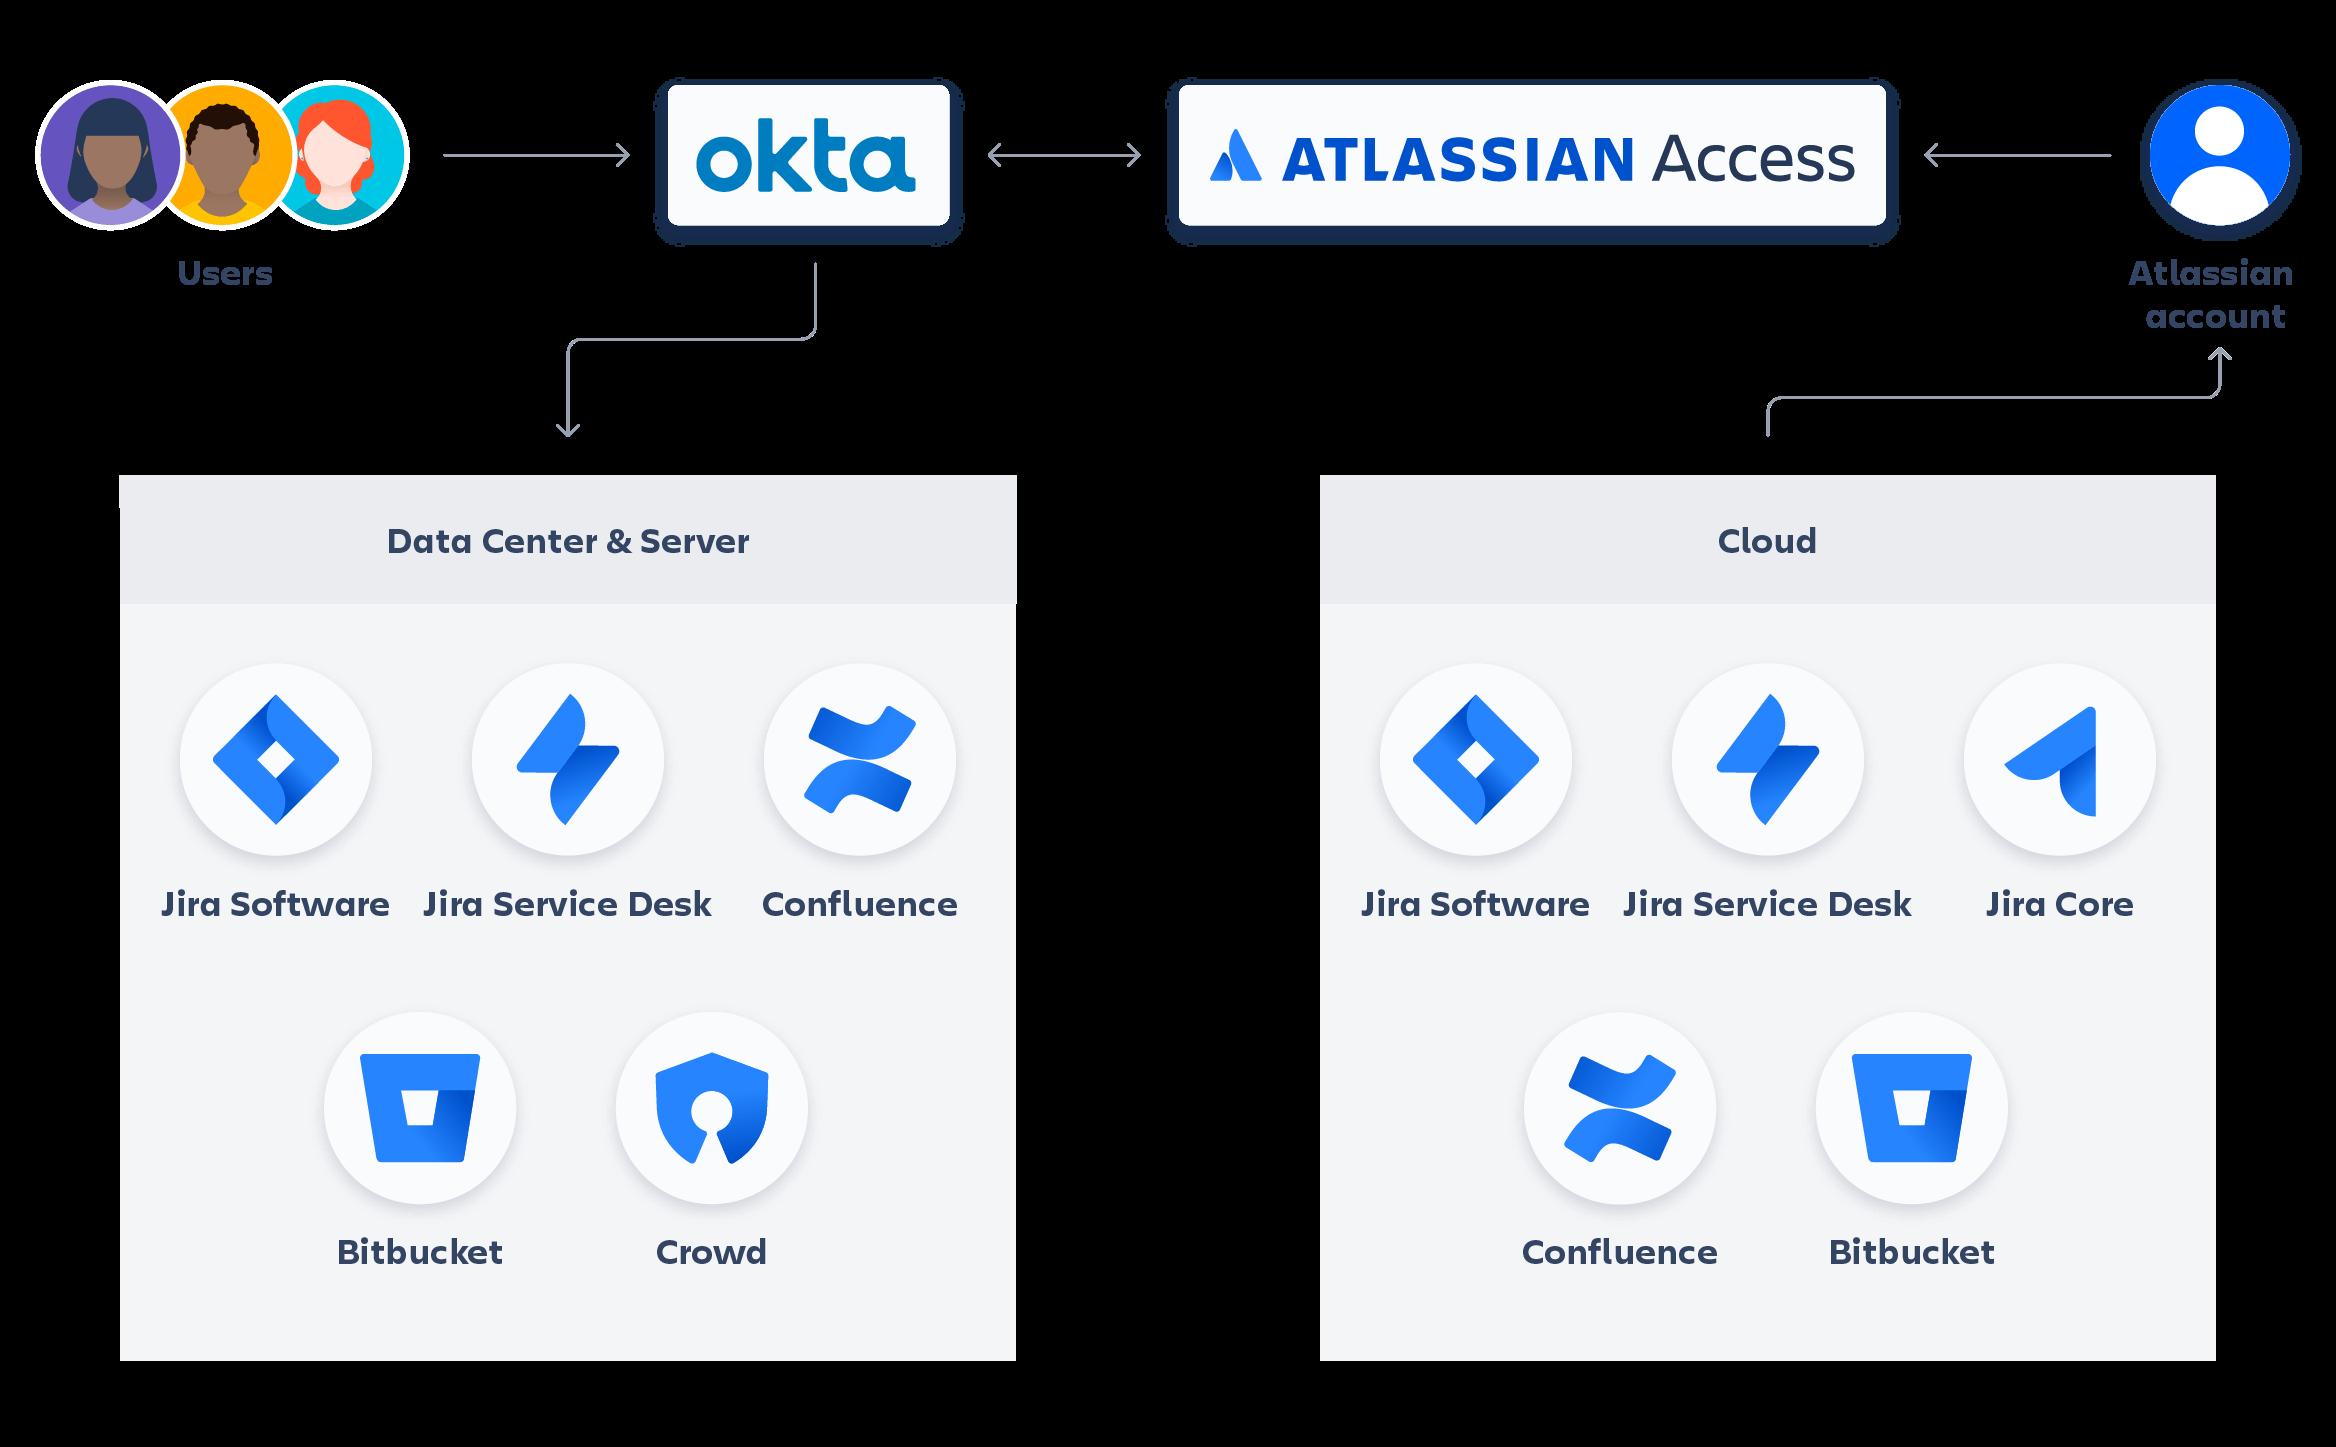 Atlassian + Okta diagram